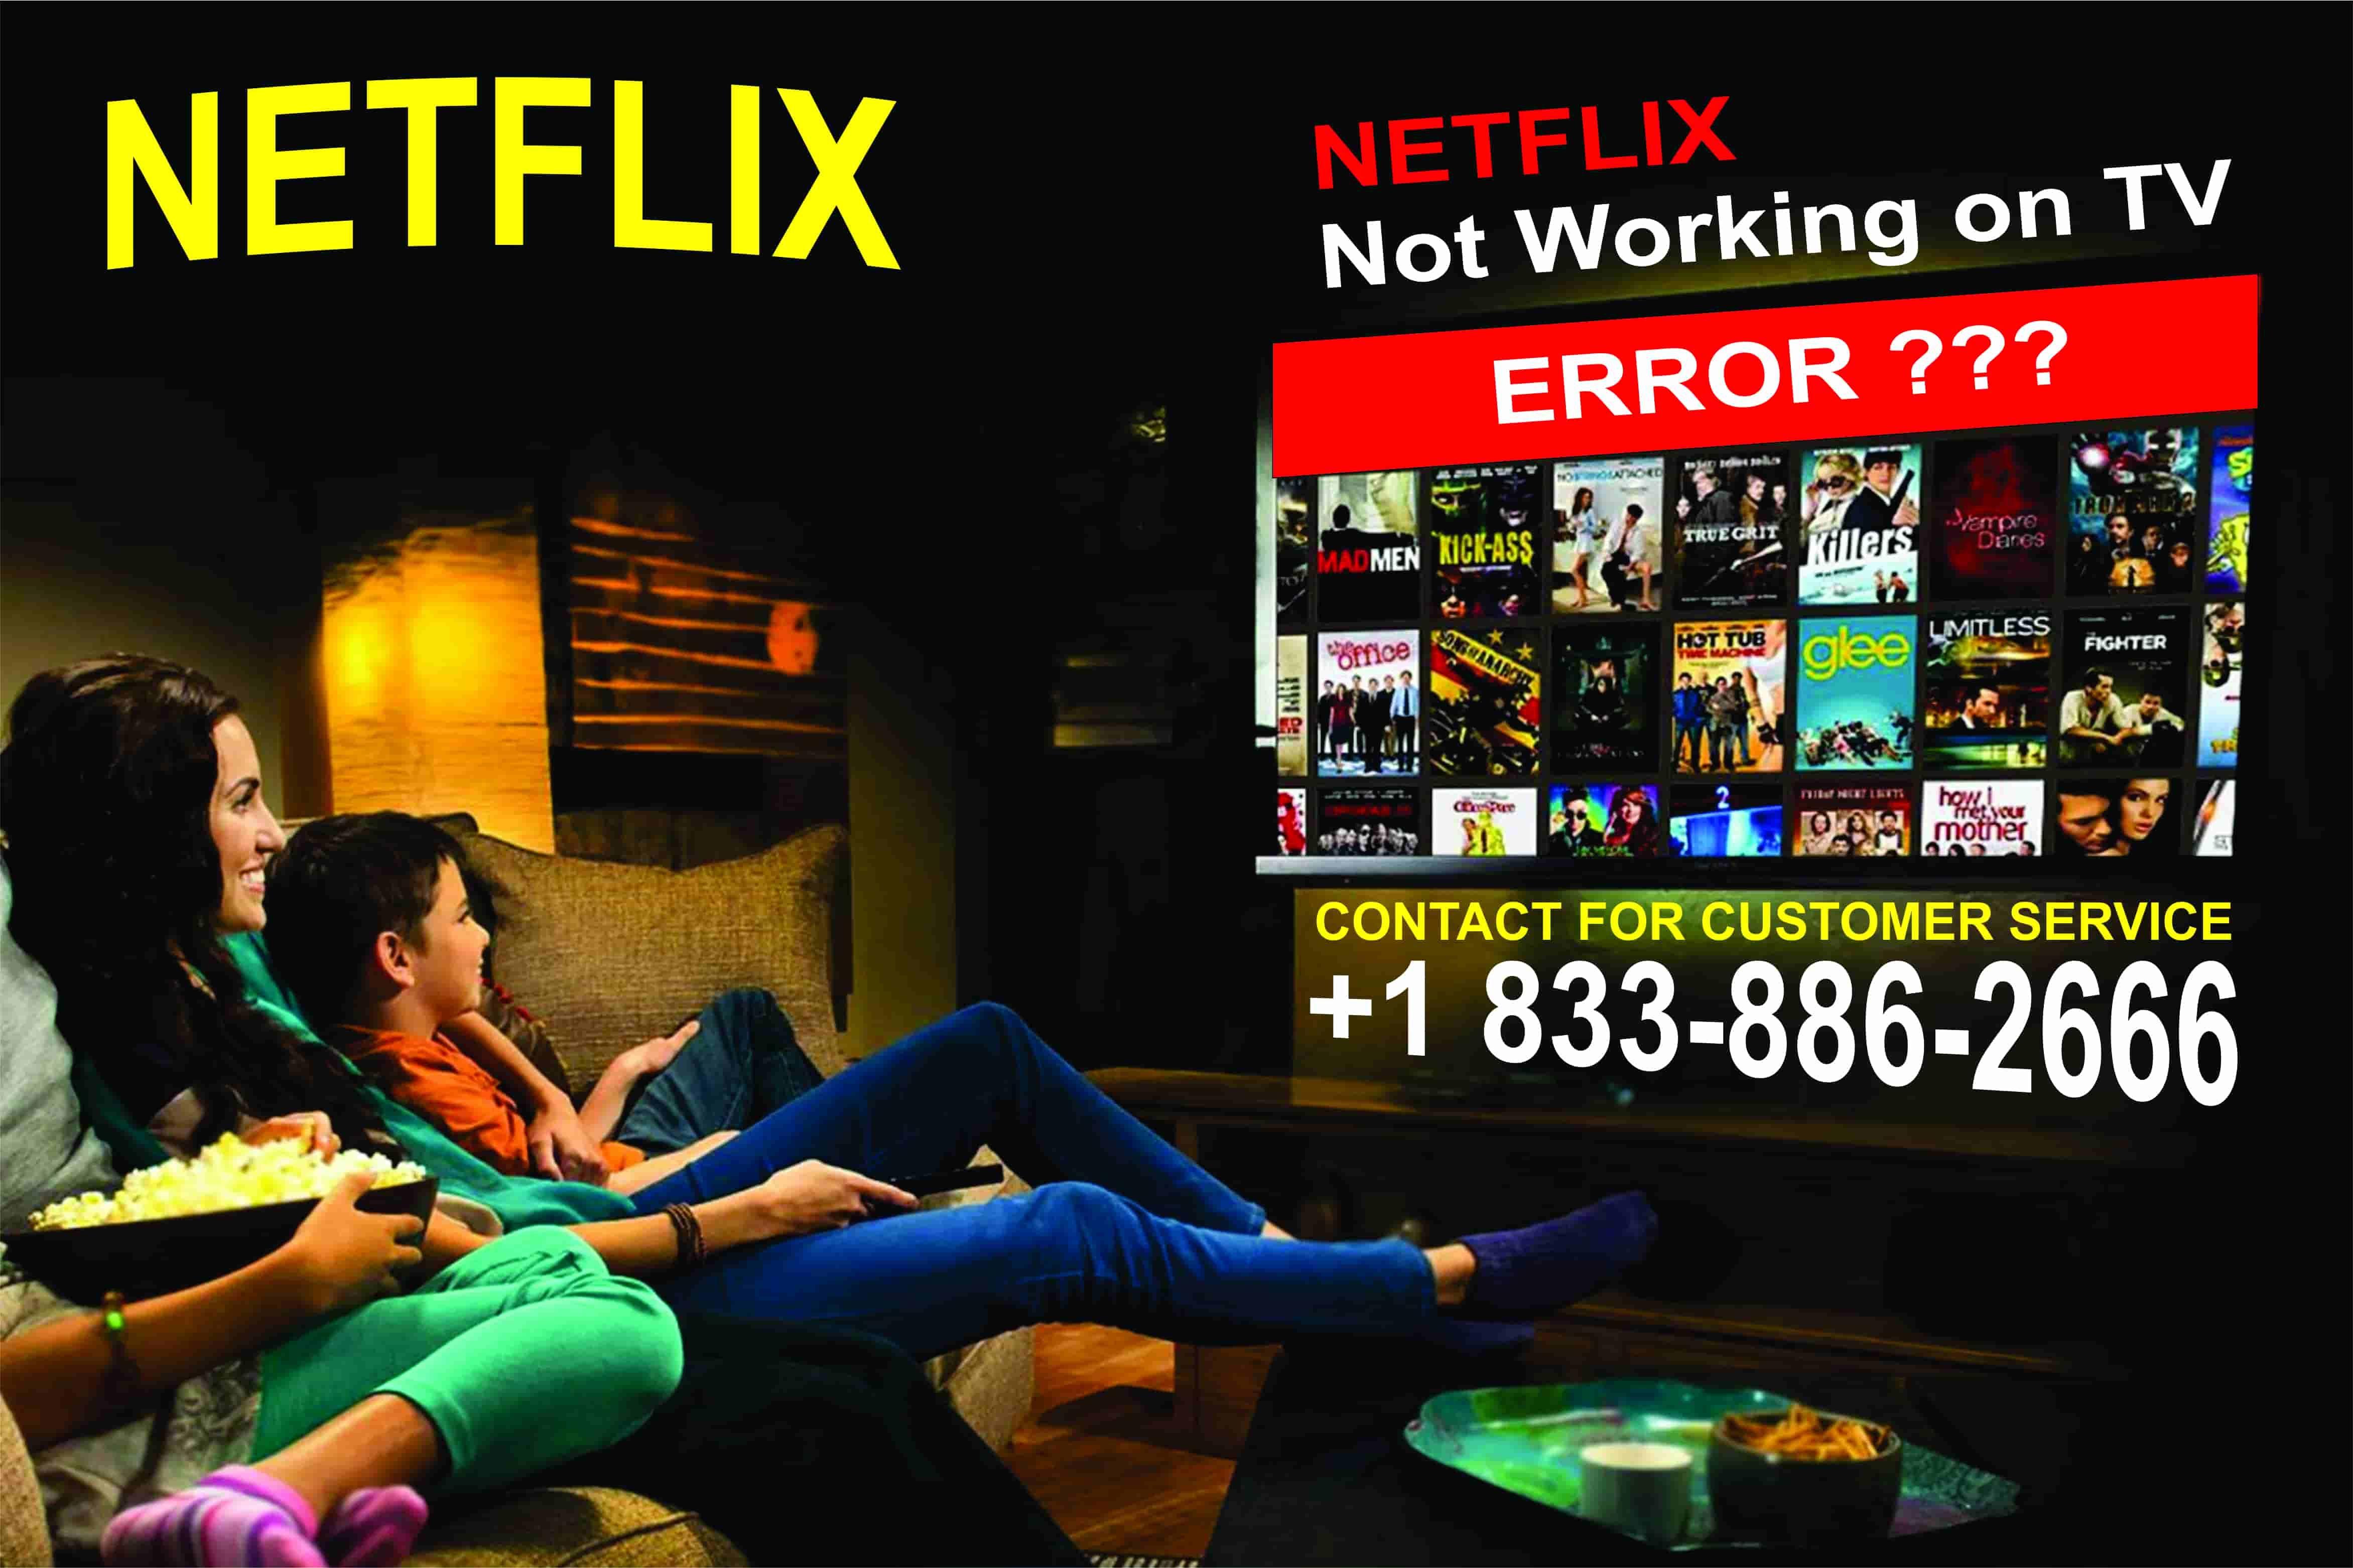 1a464d7042fa20d4e1b373dfa342f9af - How To Get Netflix App On Samsung Smart Tv